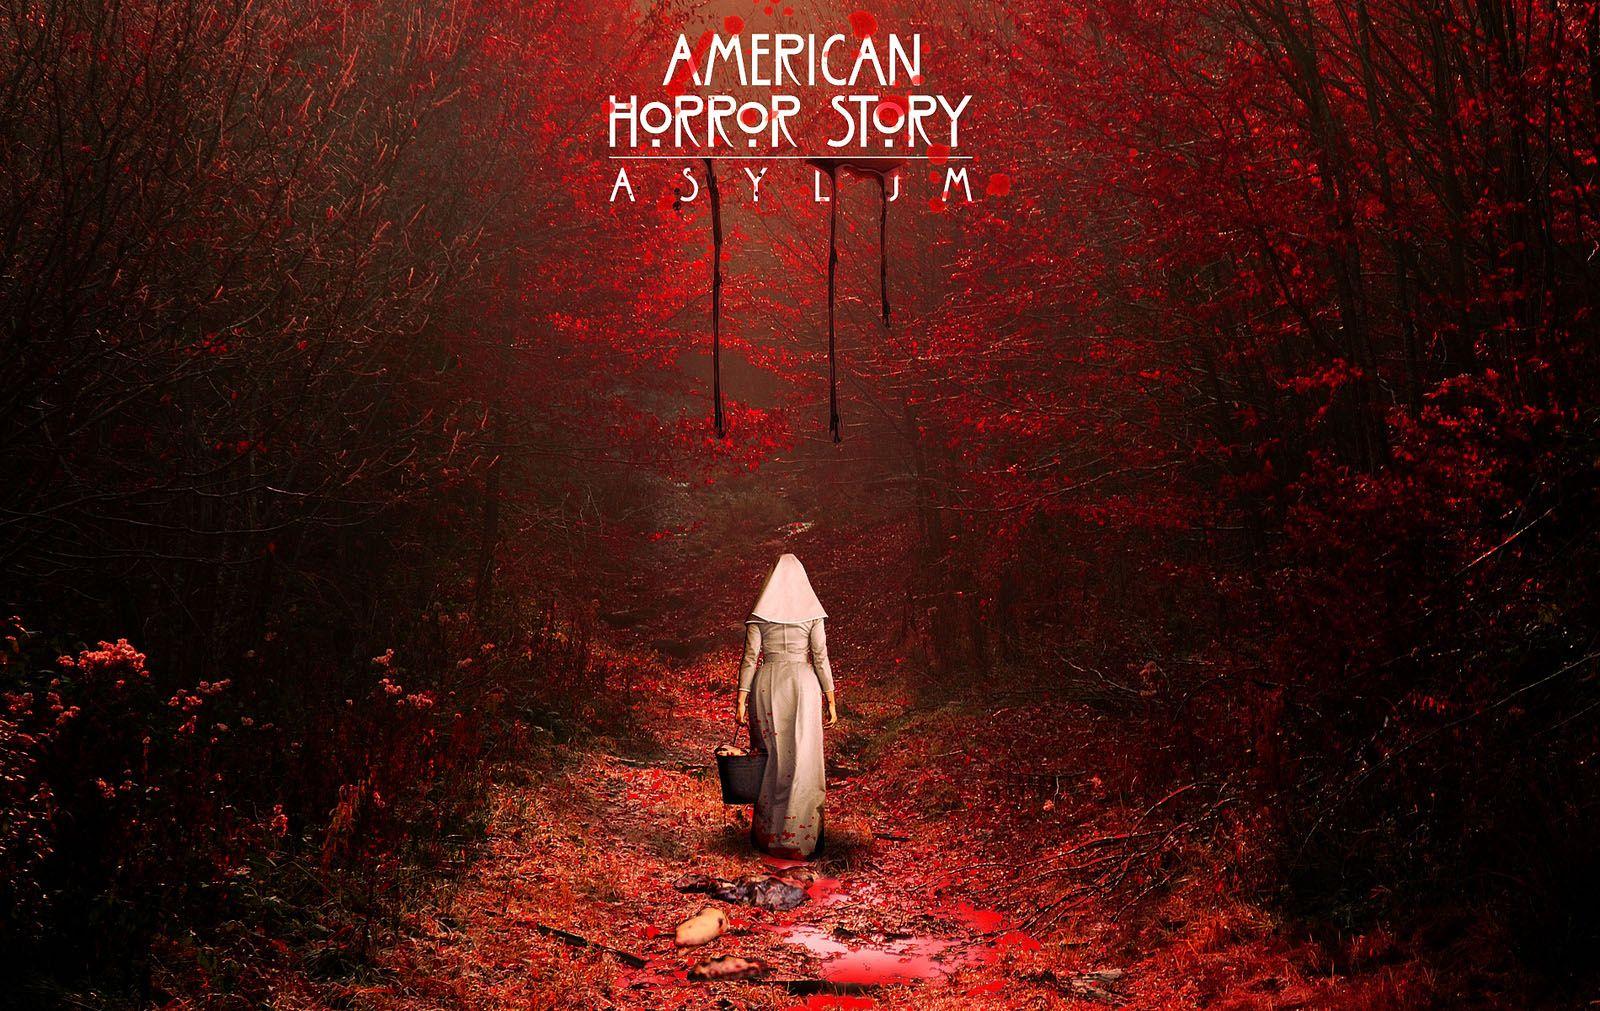 Download American Horror Story All Black Wallpaper 1280720